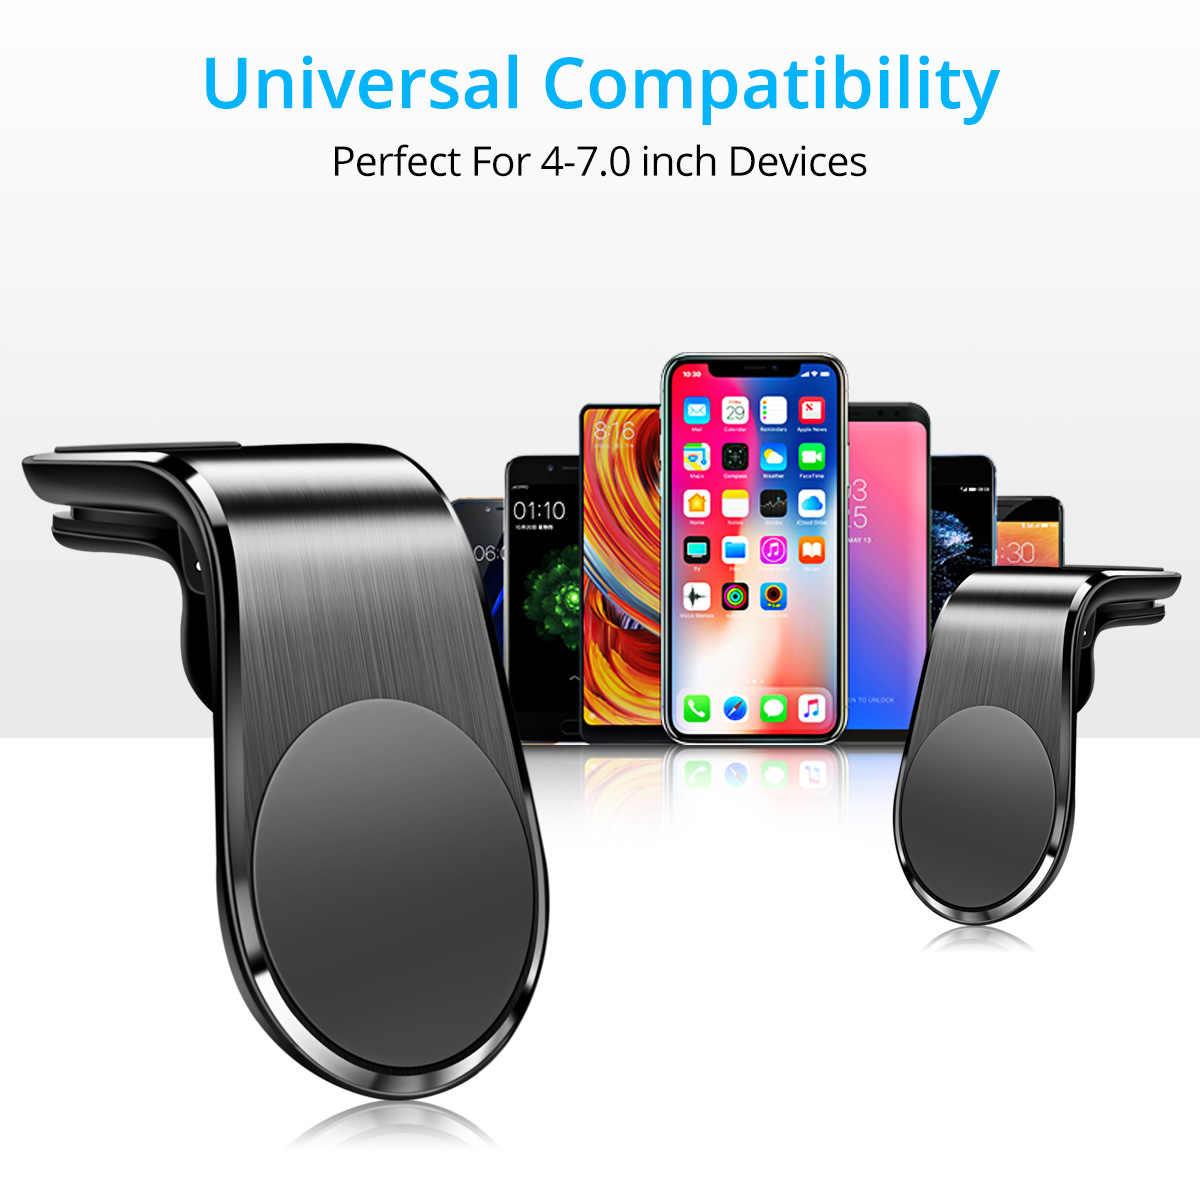 ANMONEผู้ถือบัตรโทรศัพท์แม่เหล็กสำหรับIphone11 Universal Air Outletโลหะแม่เหล็กนำทางวงเล็บหมุน 360 องศา